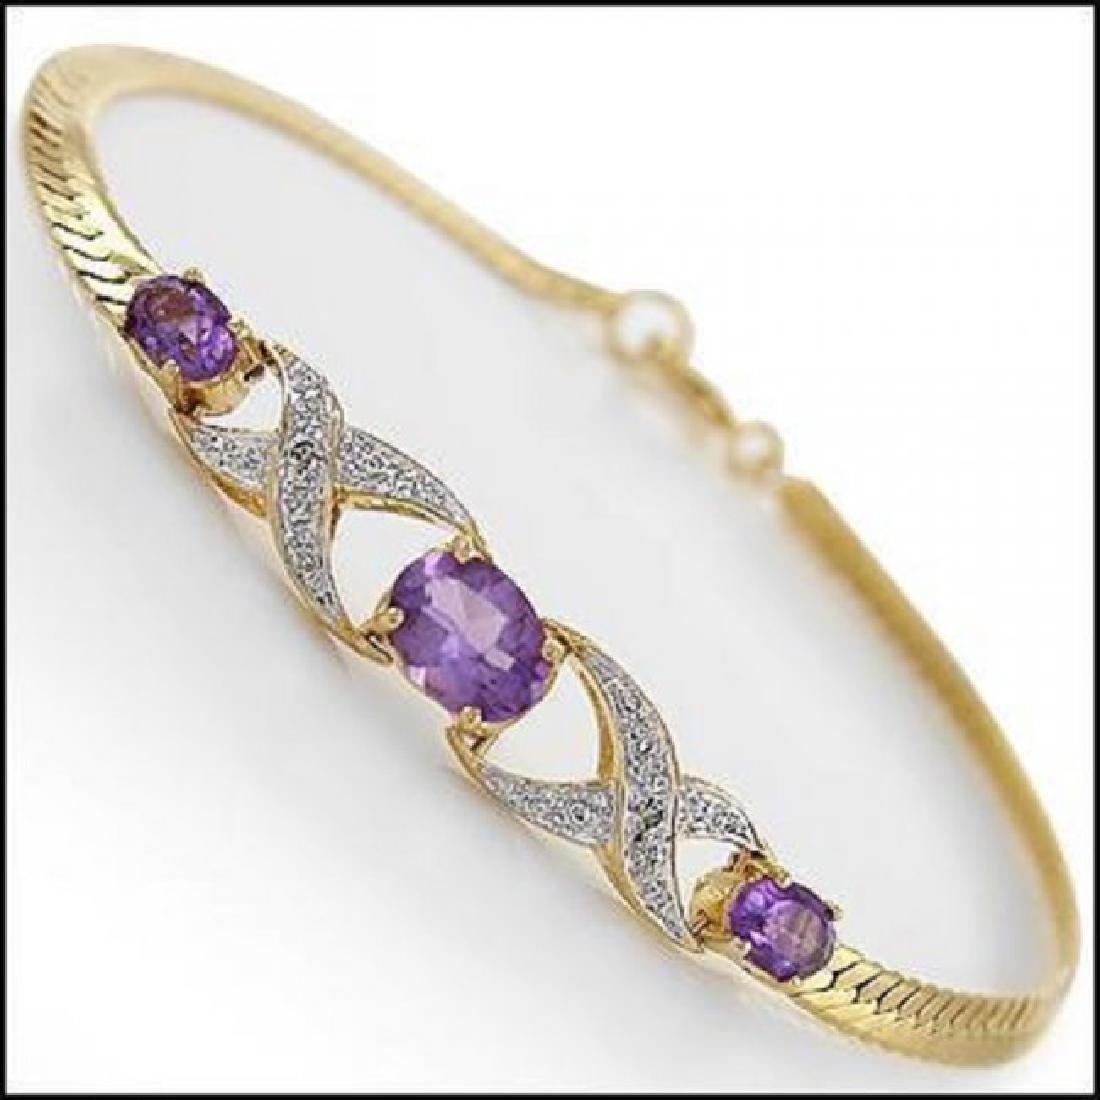 3.69 CT Amethyst & Diamond Designer Bracelet $965